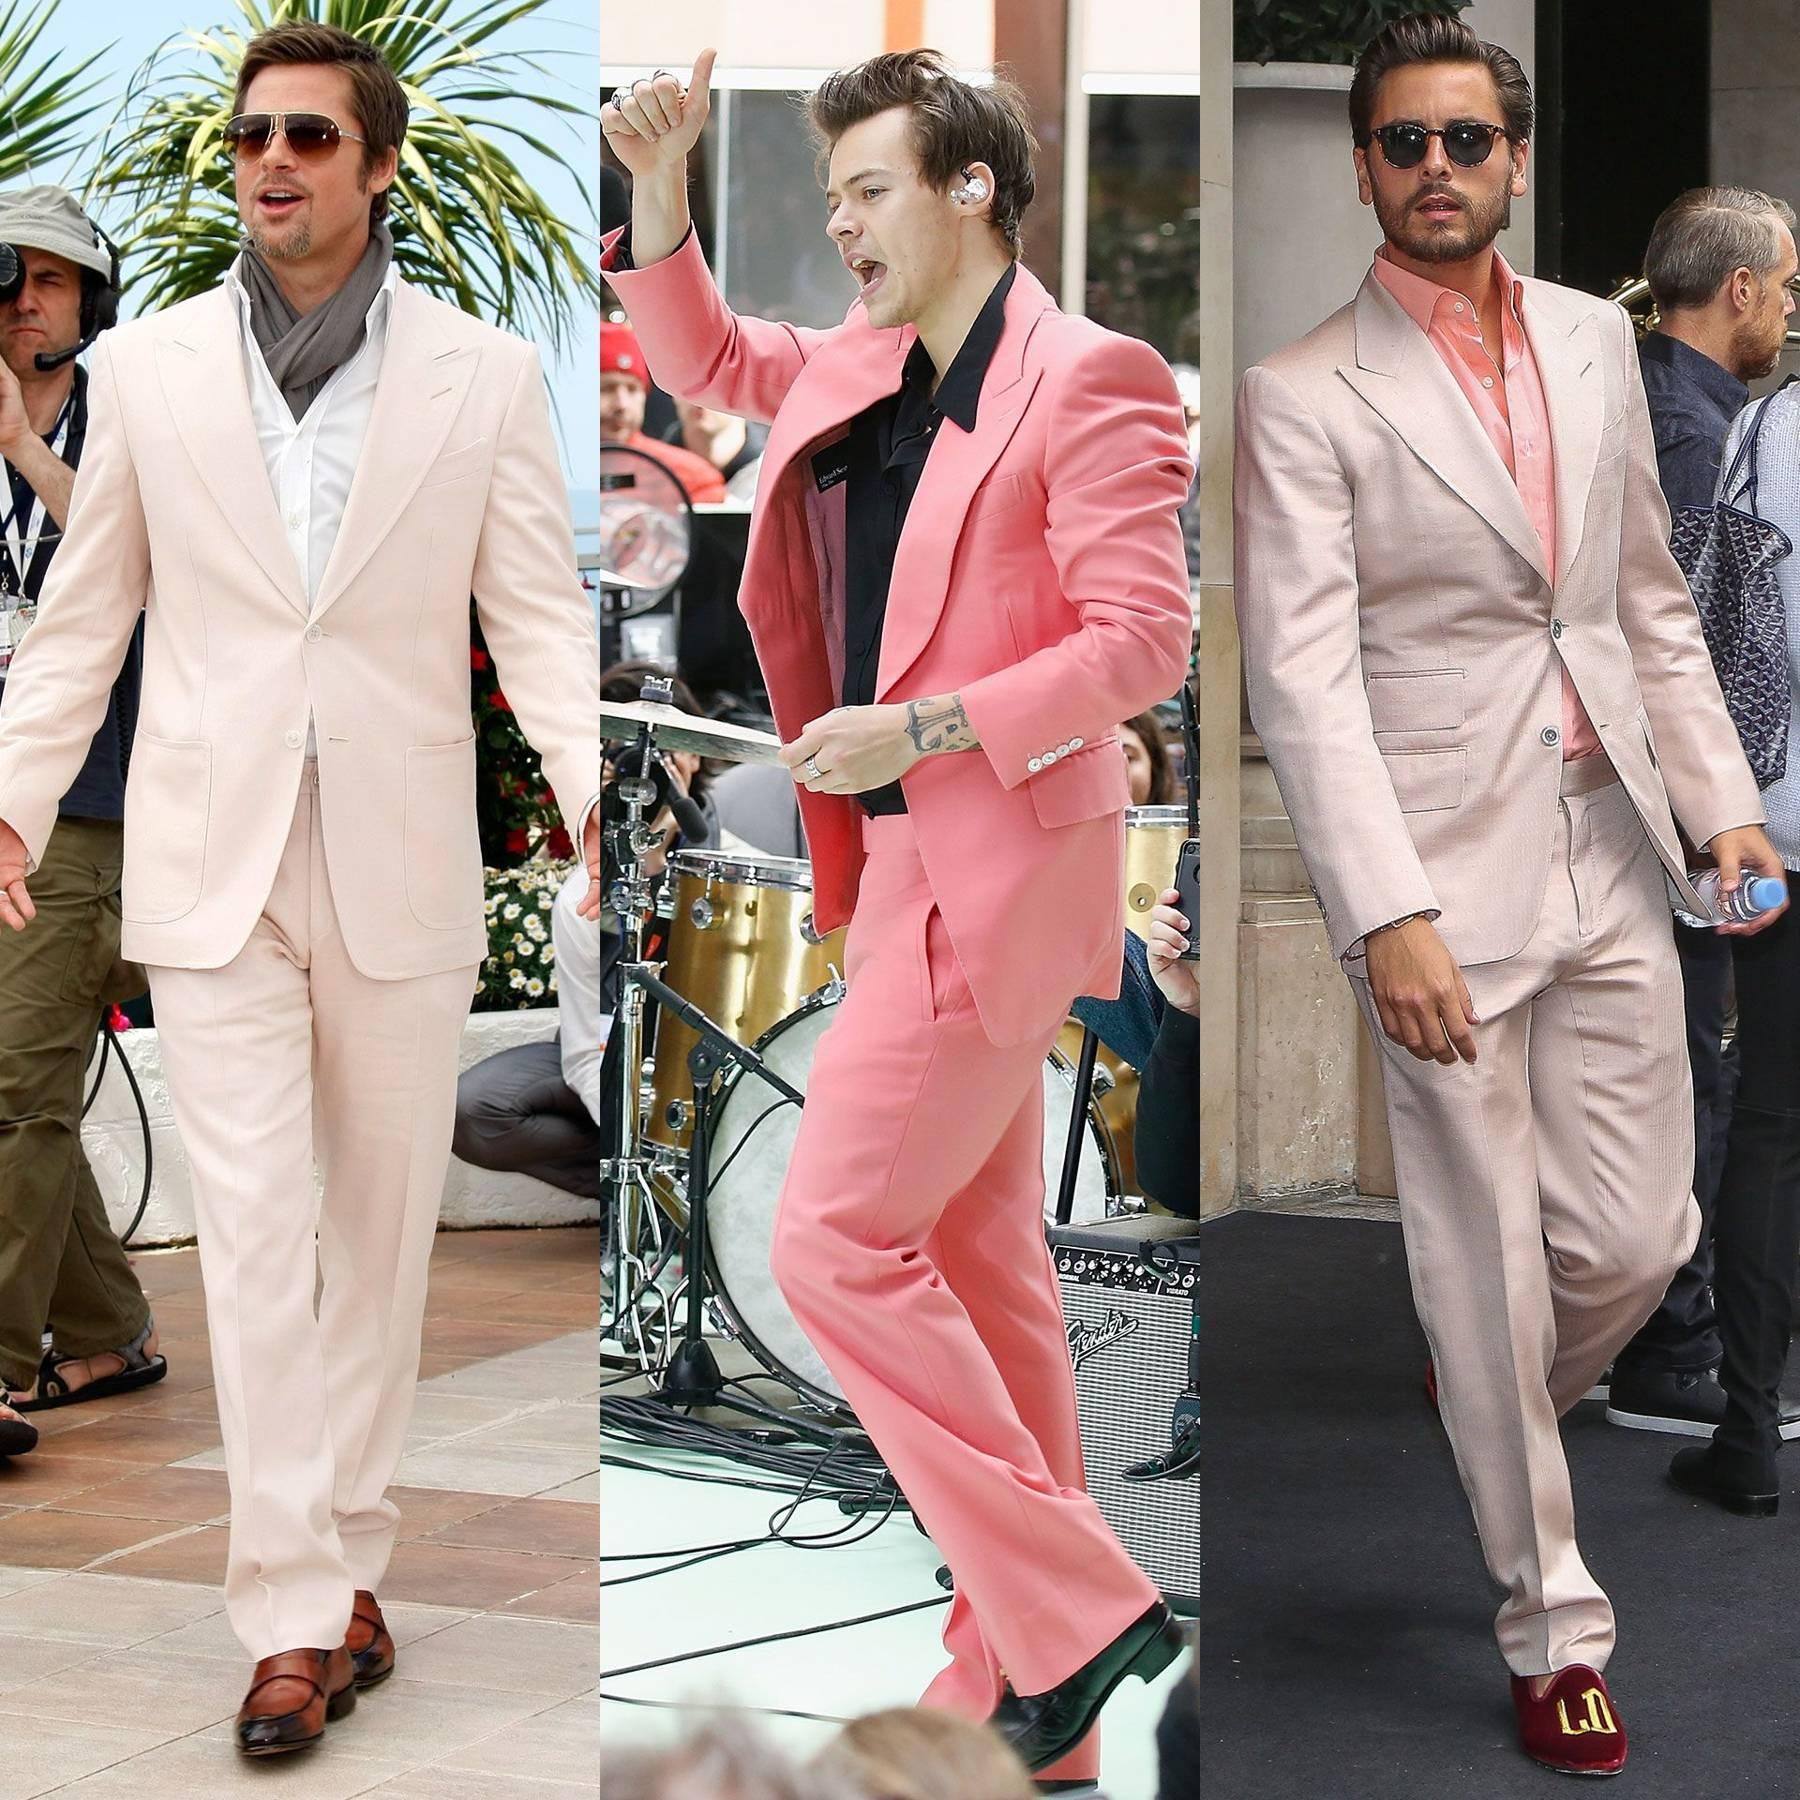 salmon shirt outfit men